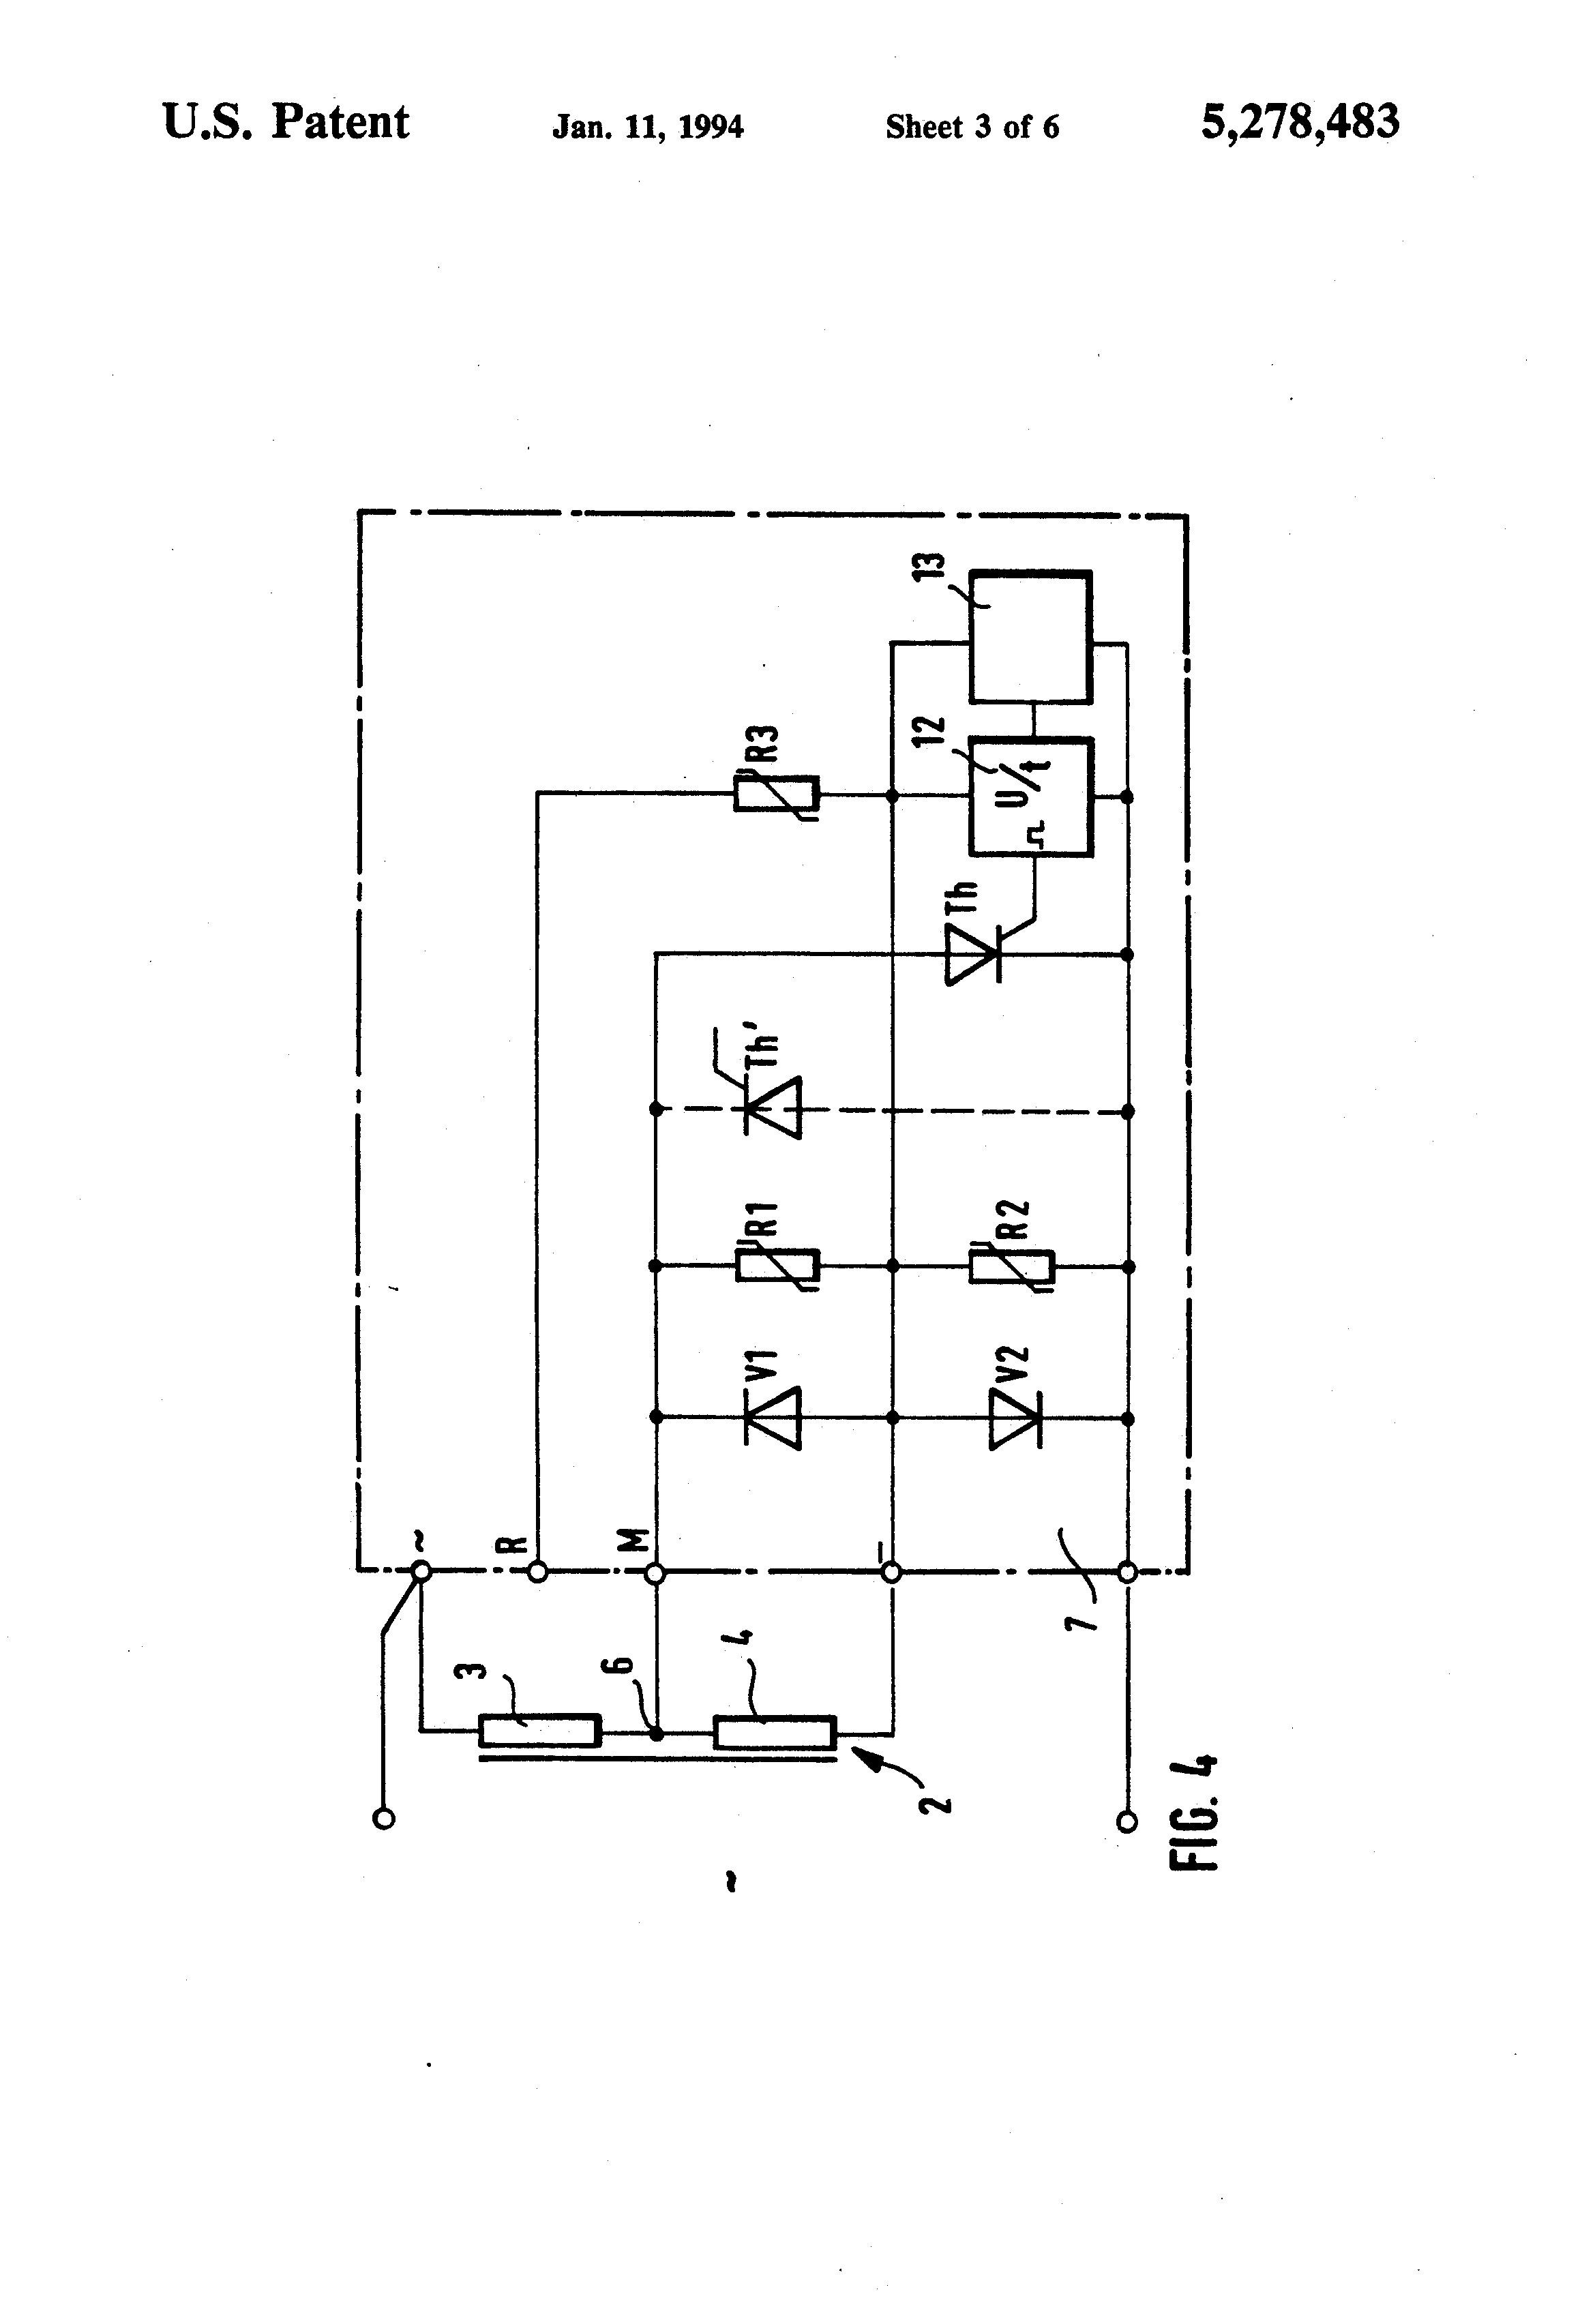 sew motor wiring kakamozza org rh kakamozza org sew drs motor wiring diagram sew motor wiring diagrams